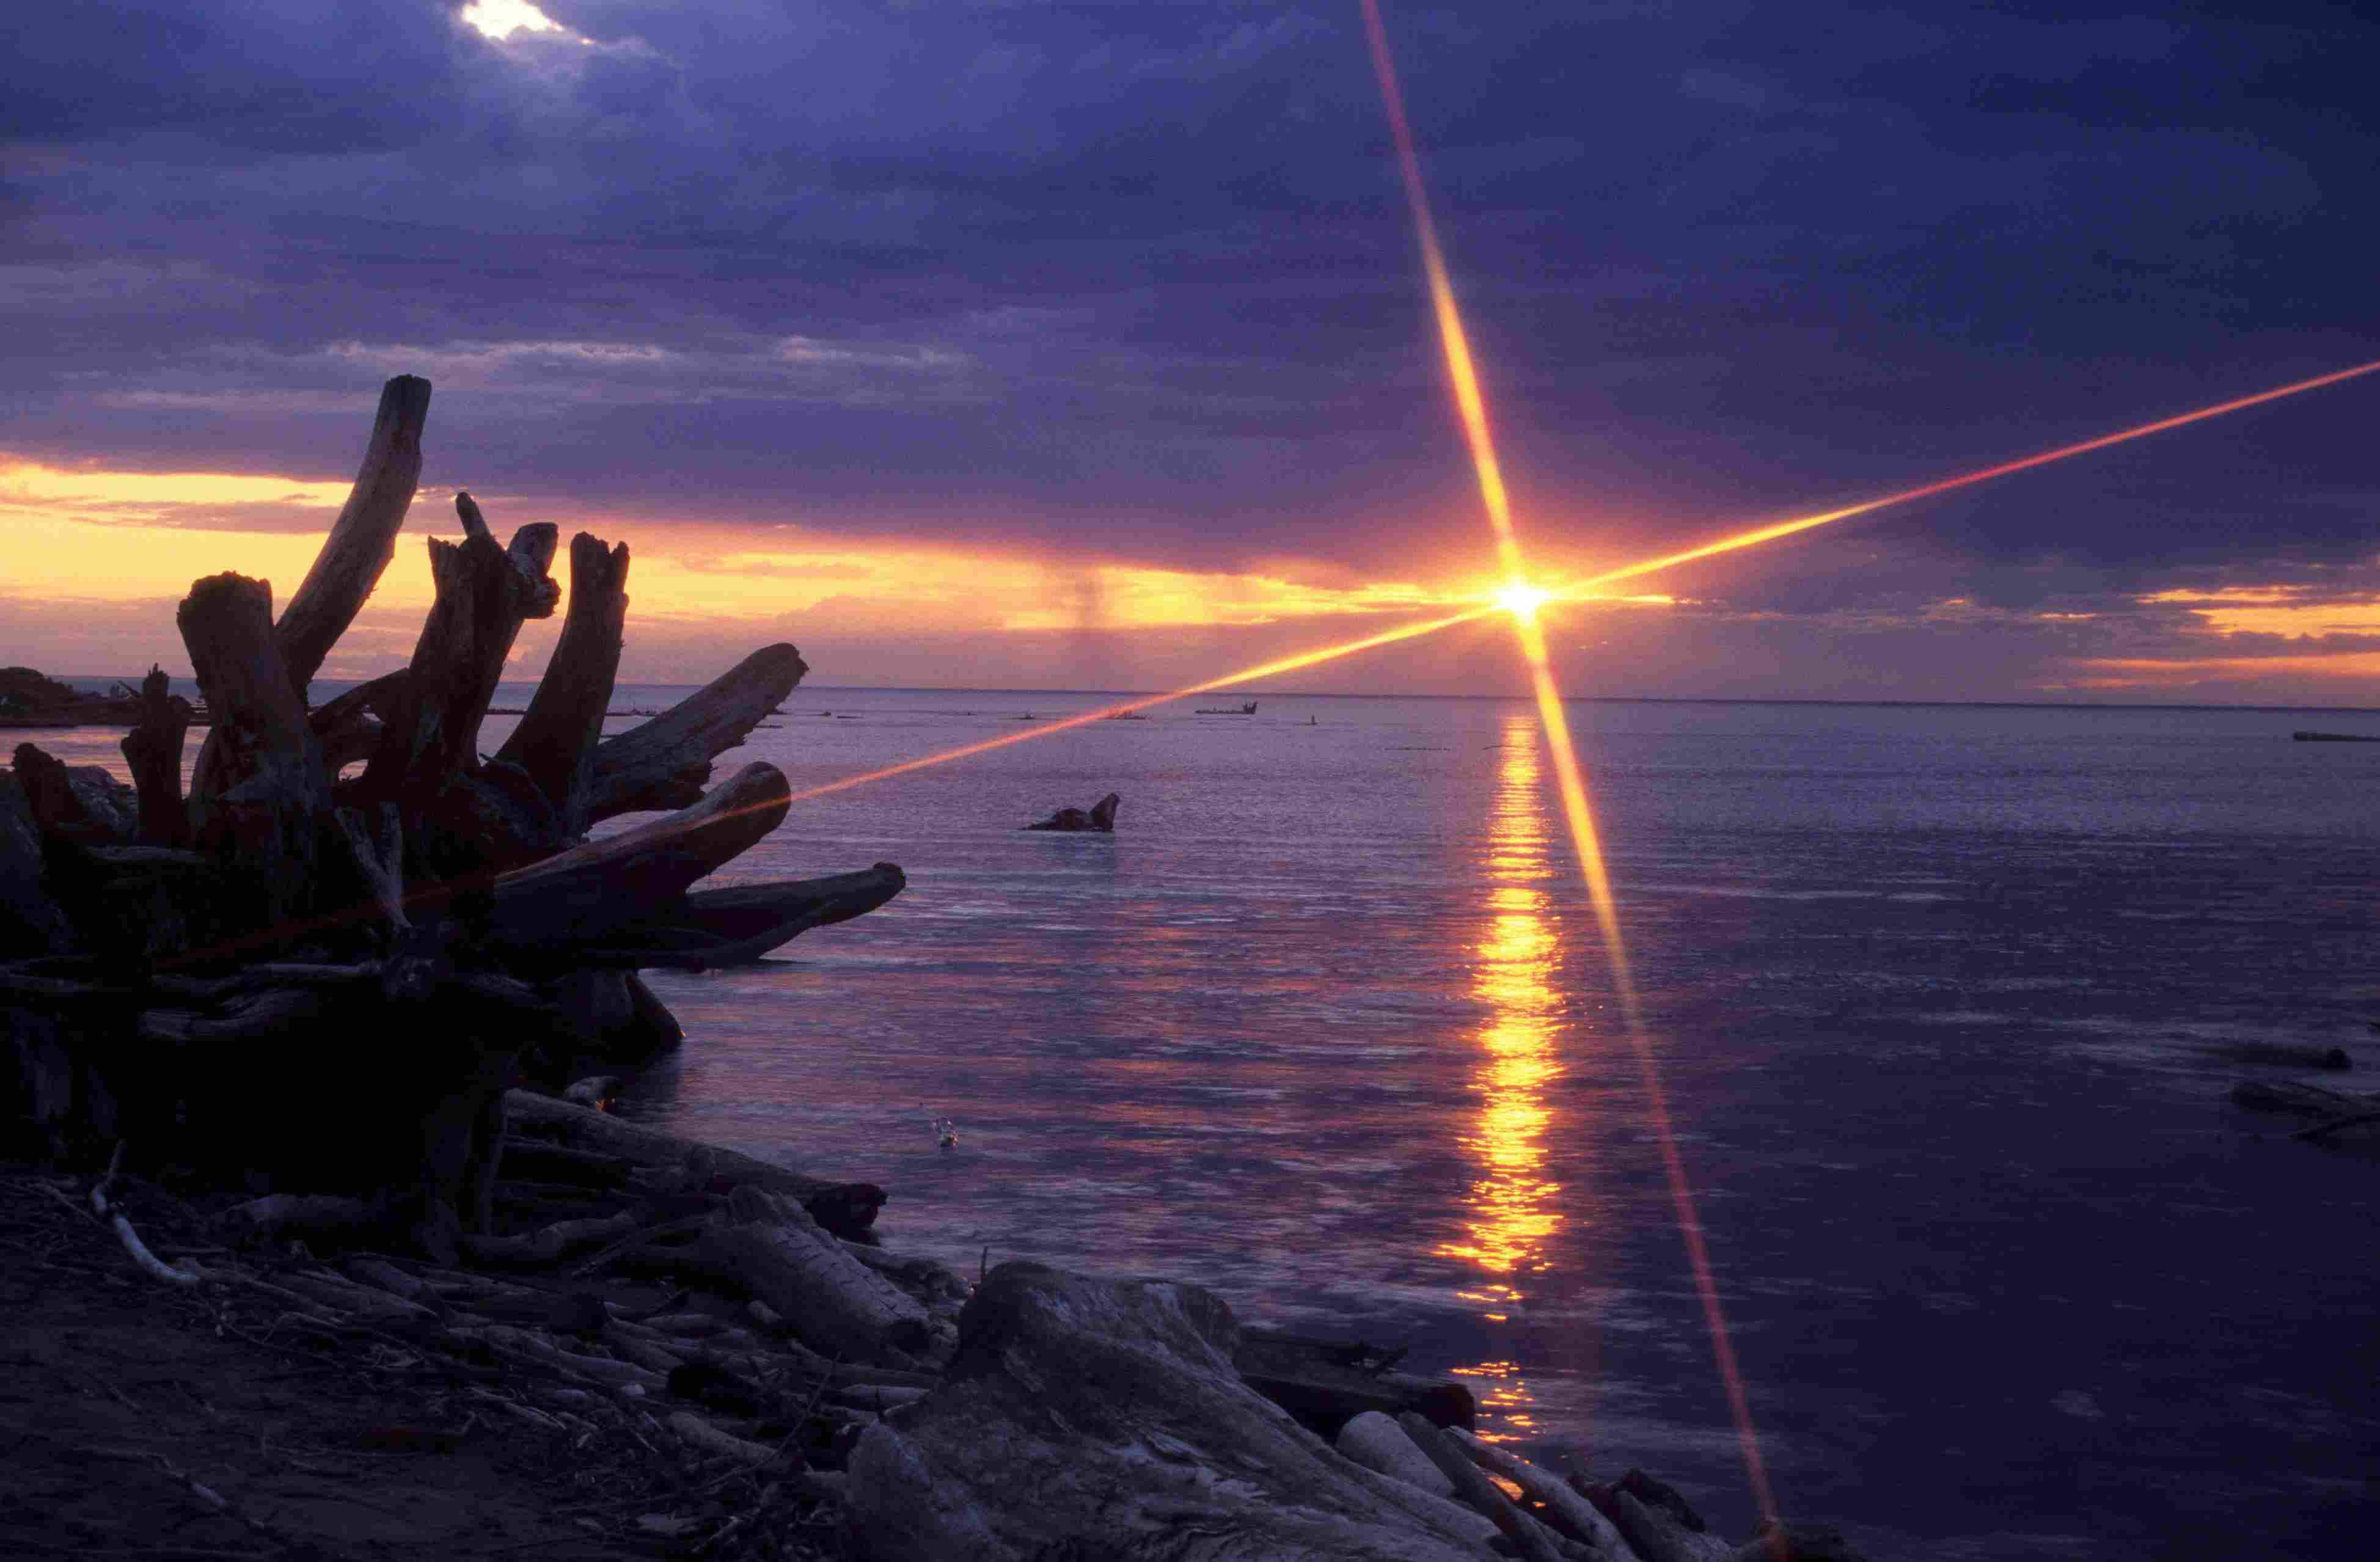 Sunset on the Great Slave Lake, Northwest Territory, Canada